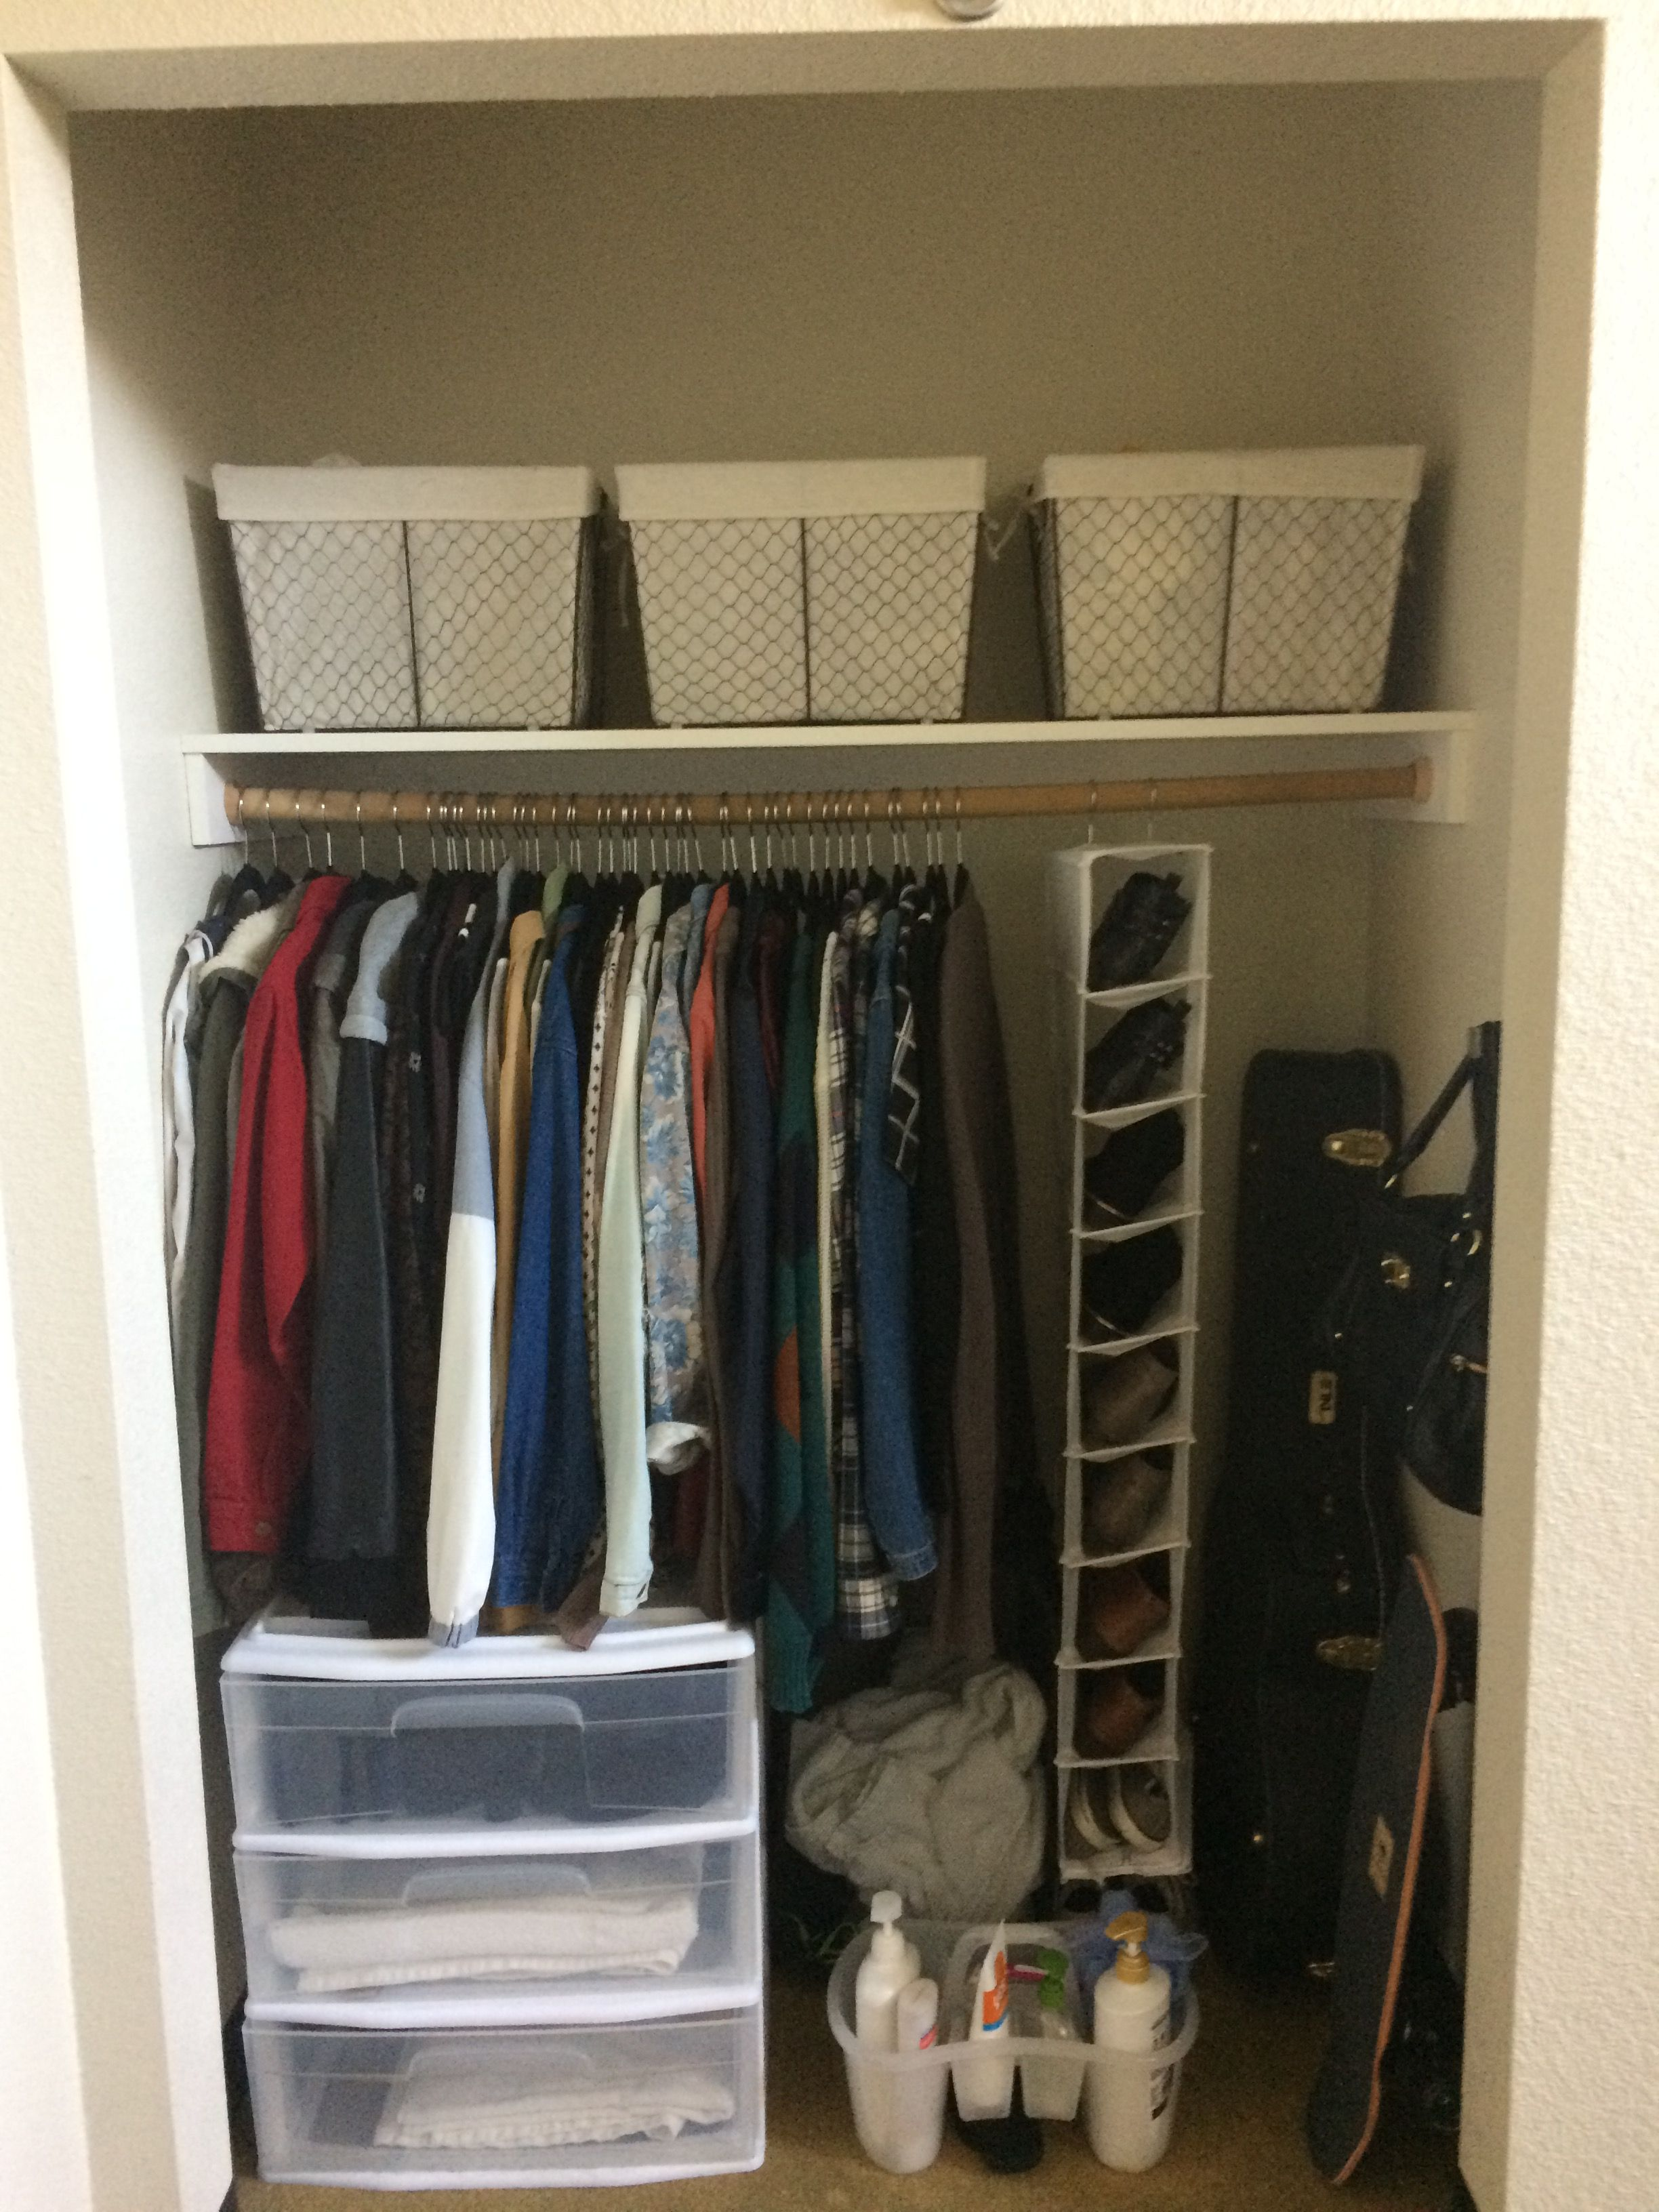 Dorm Room Closet: CSUF Residence Hall Dorm Room